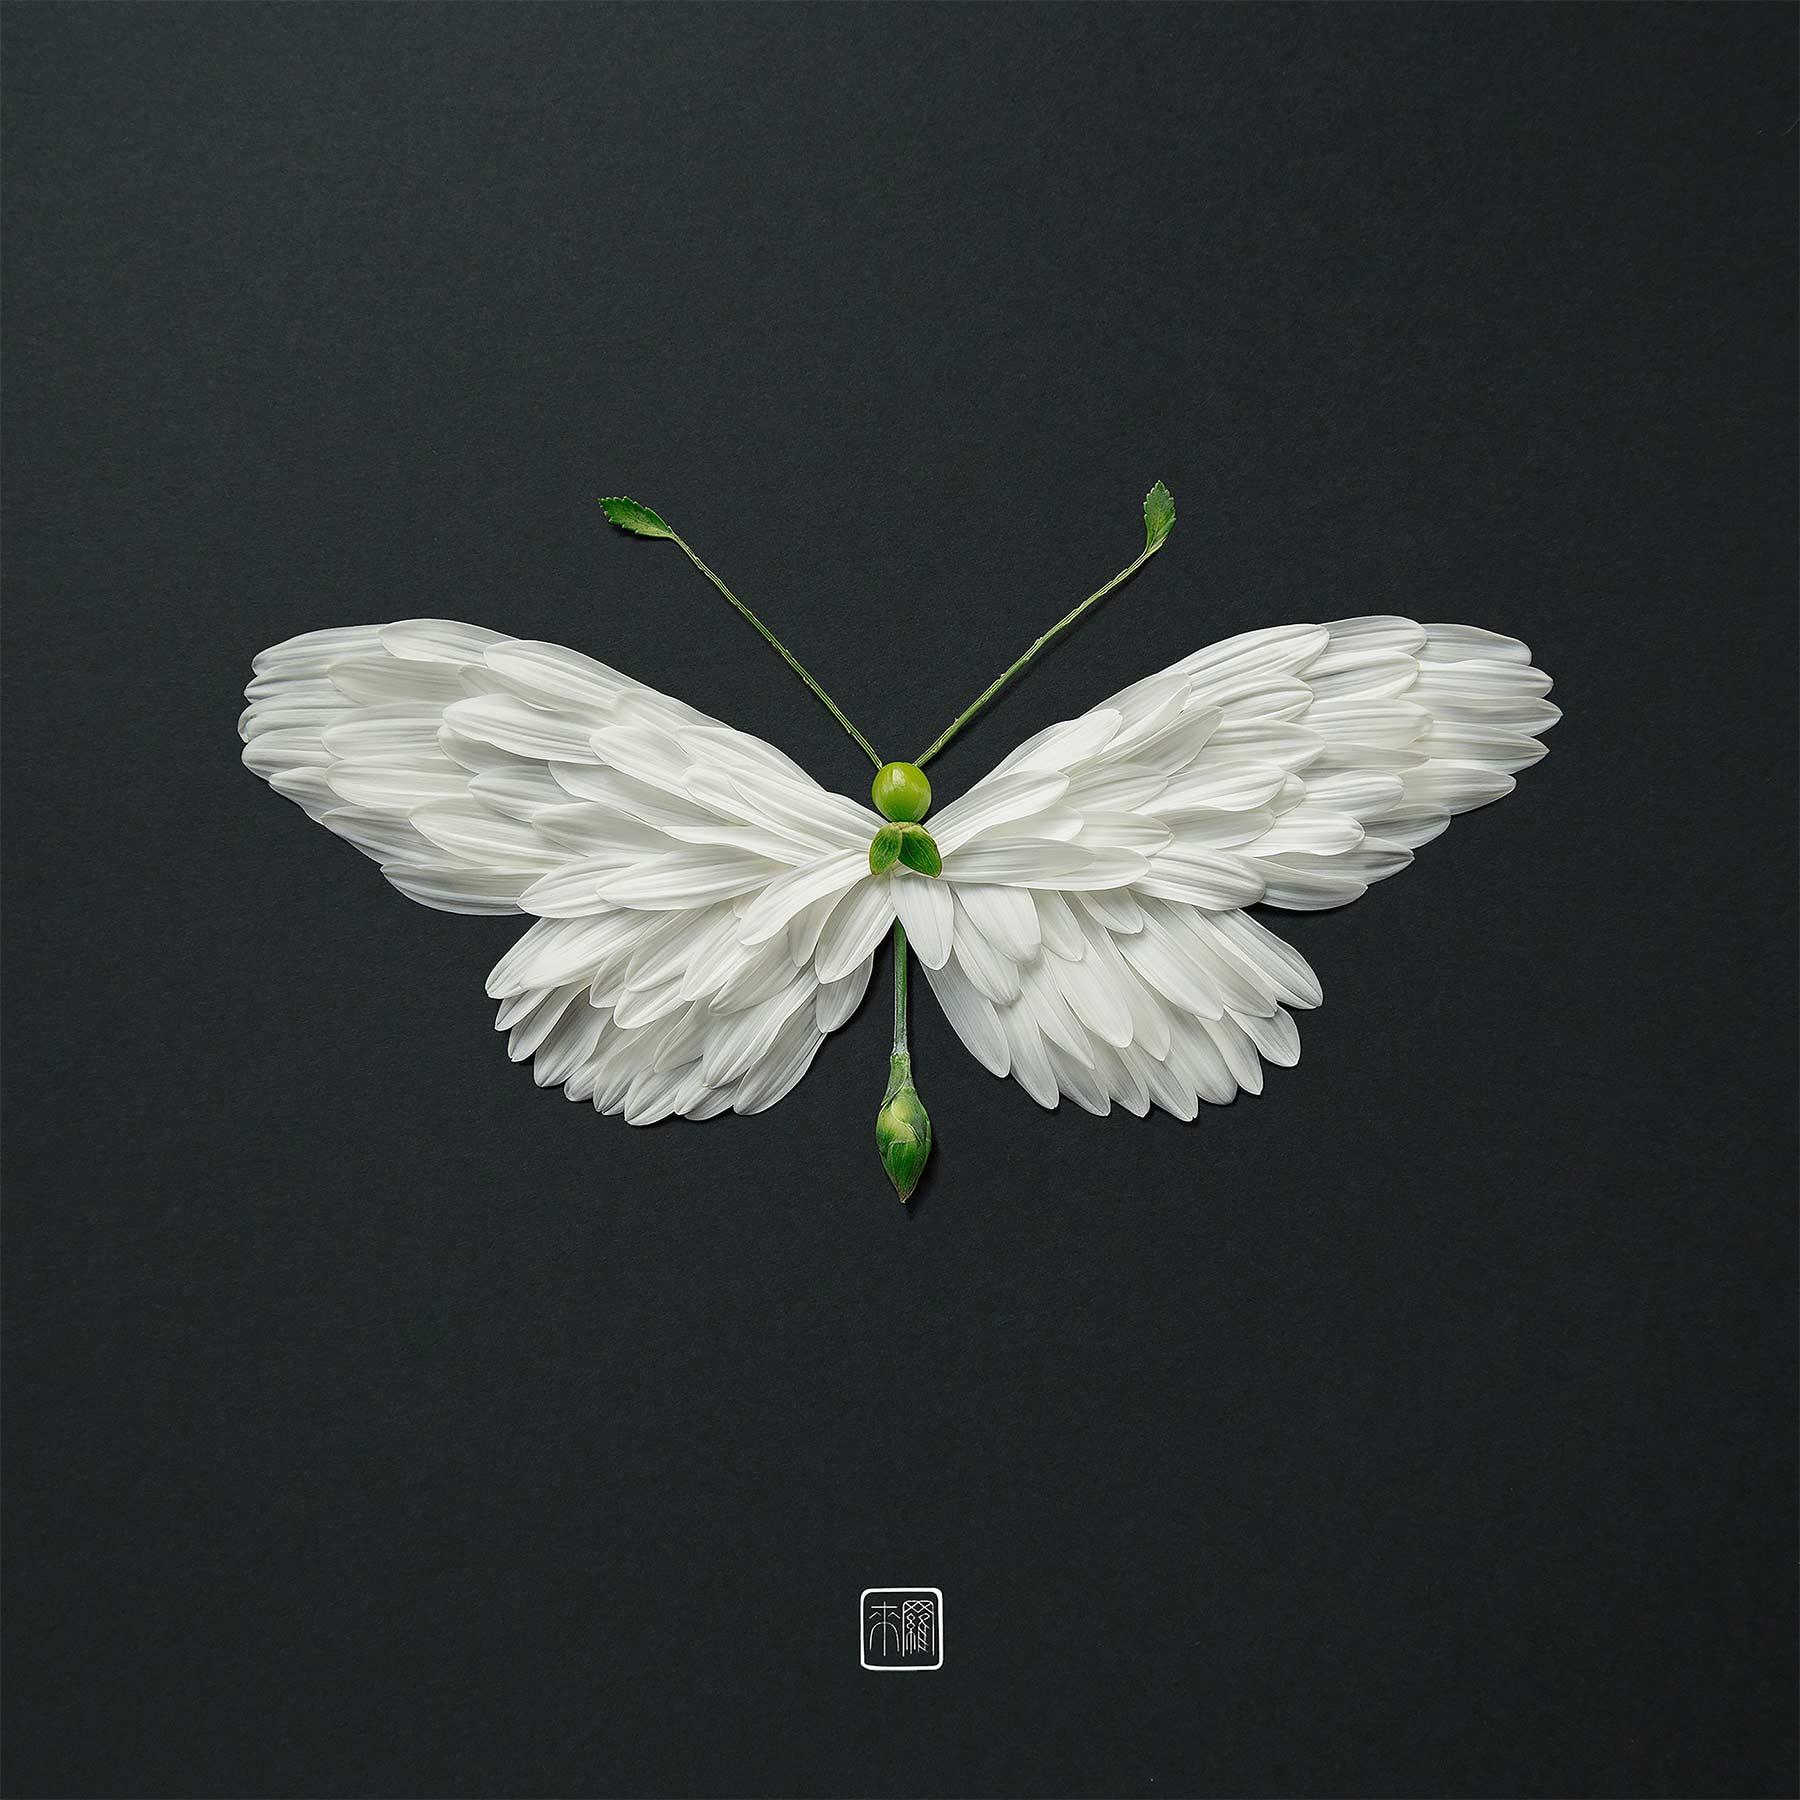 Tiere aus Blumenblüten Tiere-aus-blumenblueten-Raku-Inoue_02